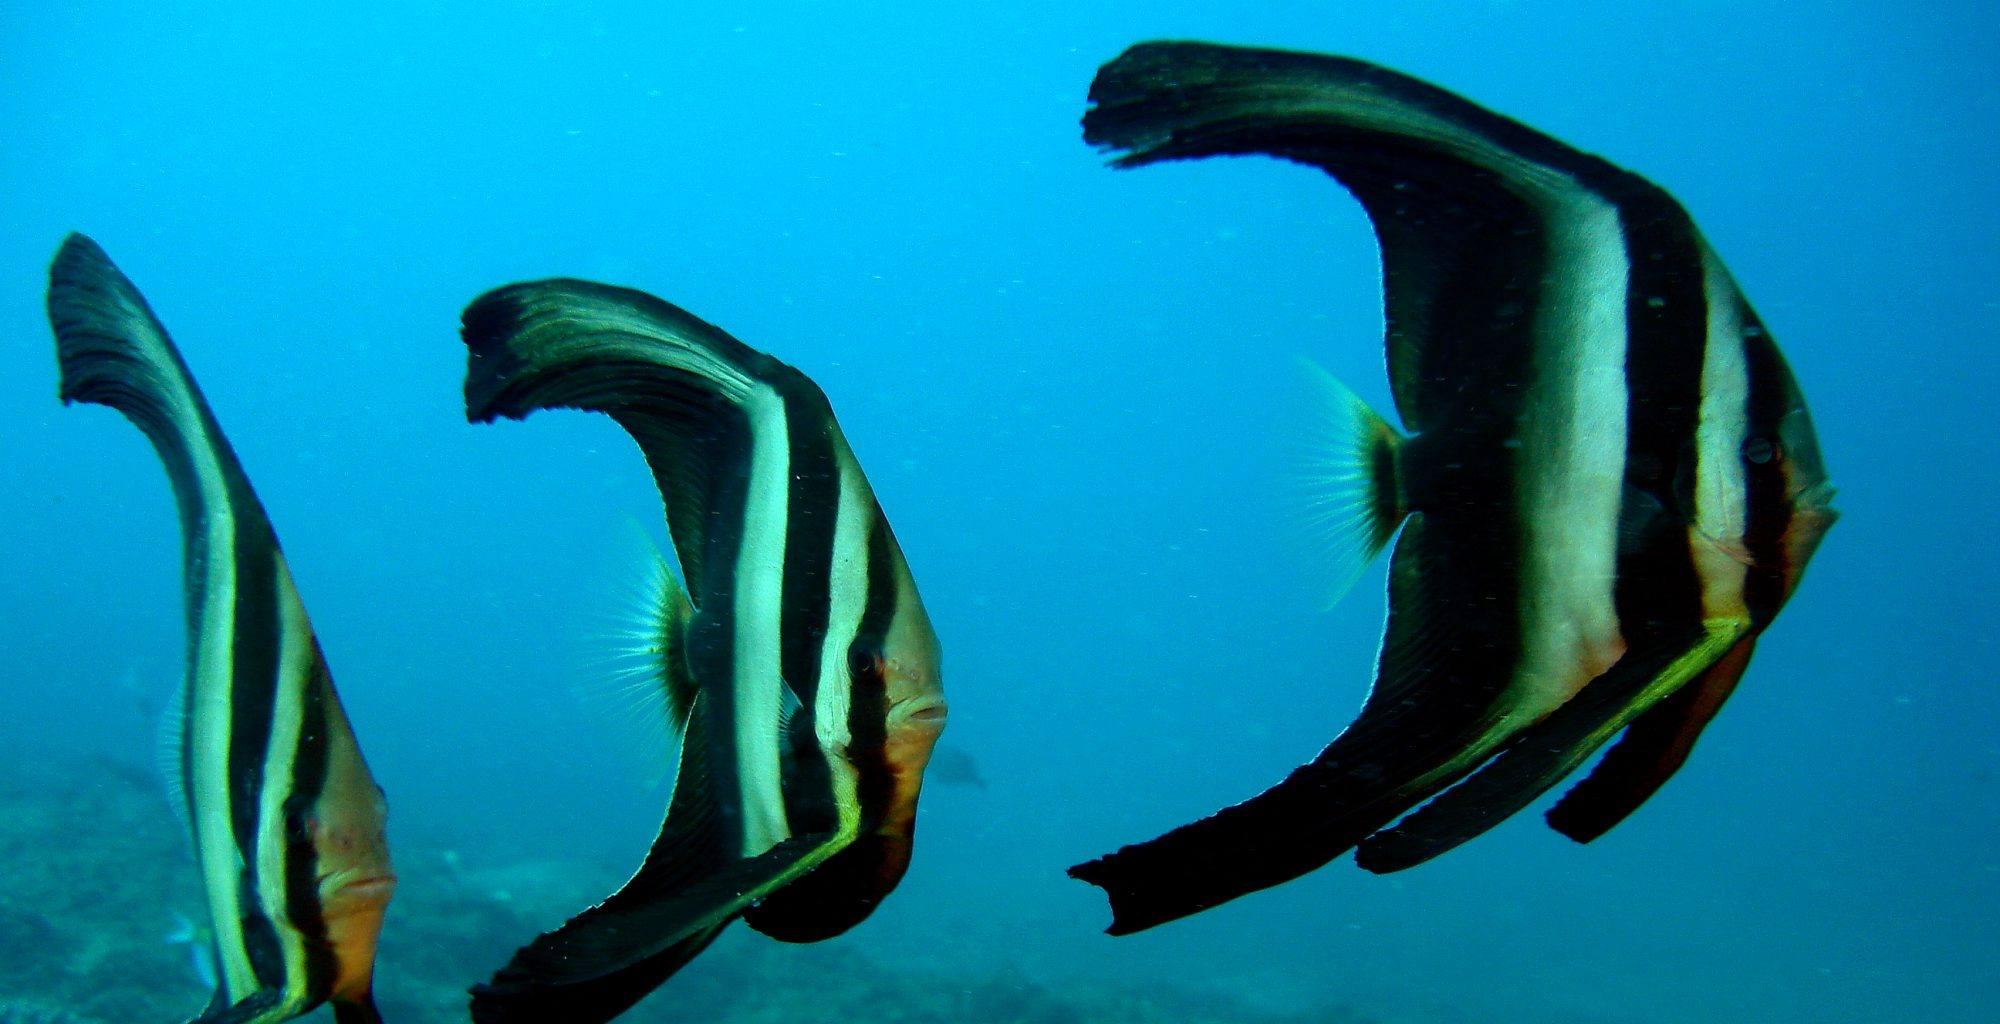 Tanzania-Mainland-Coast-Fish